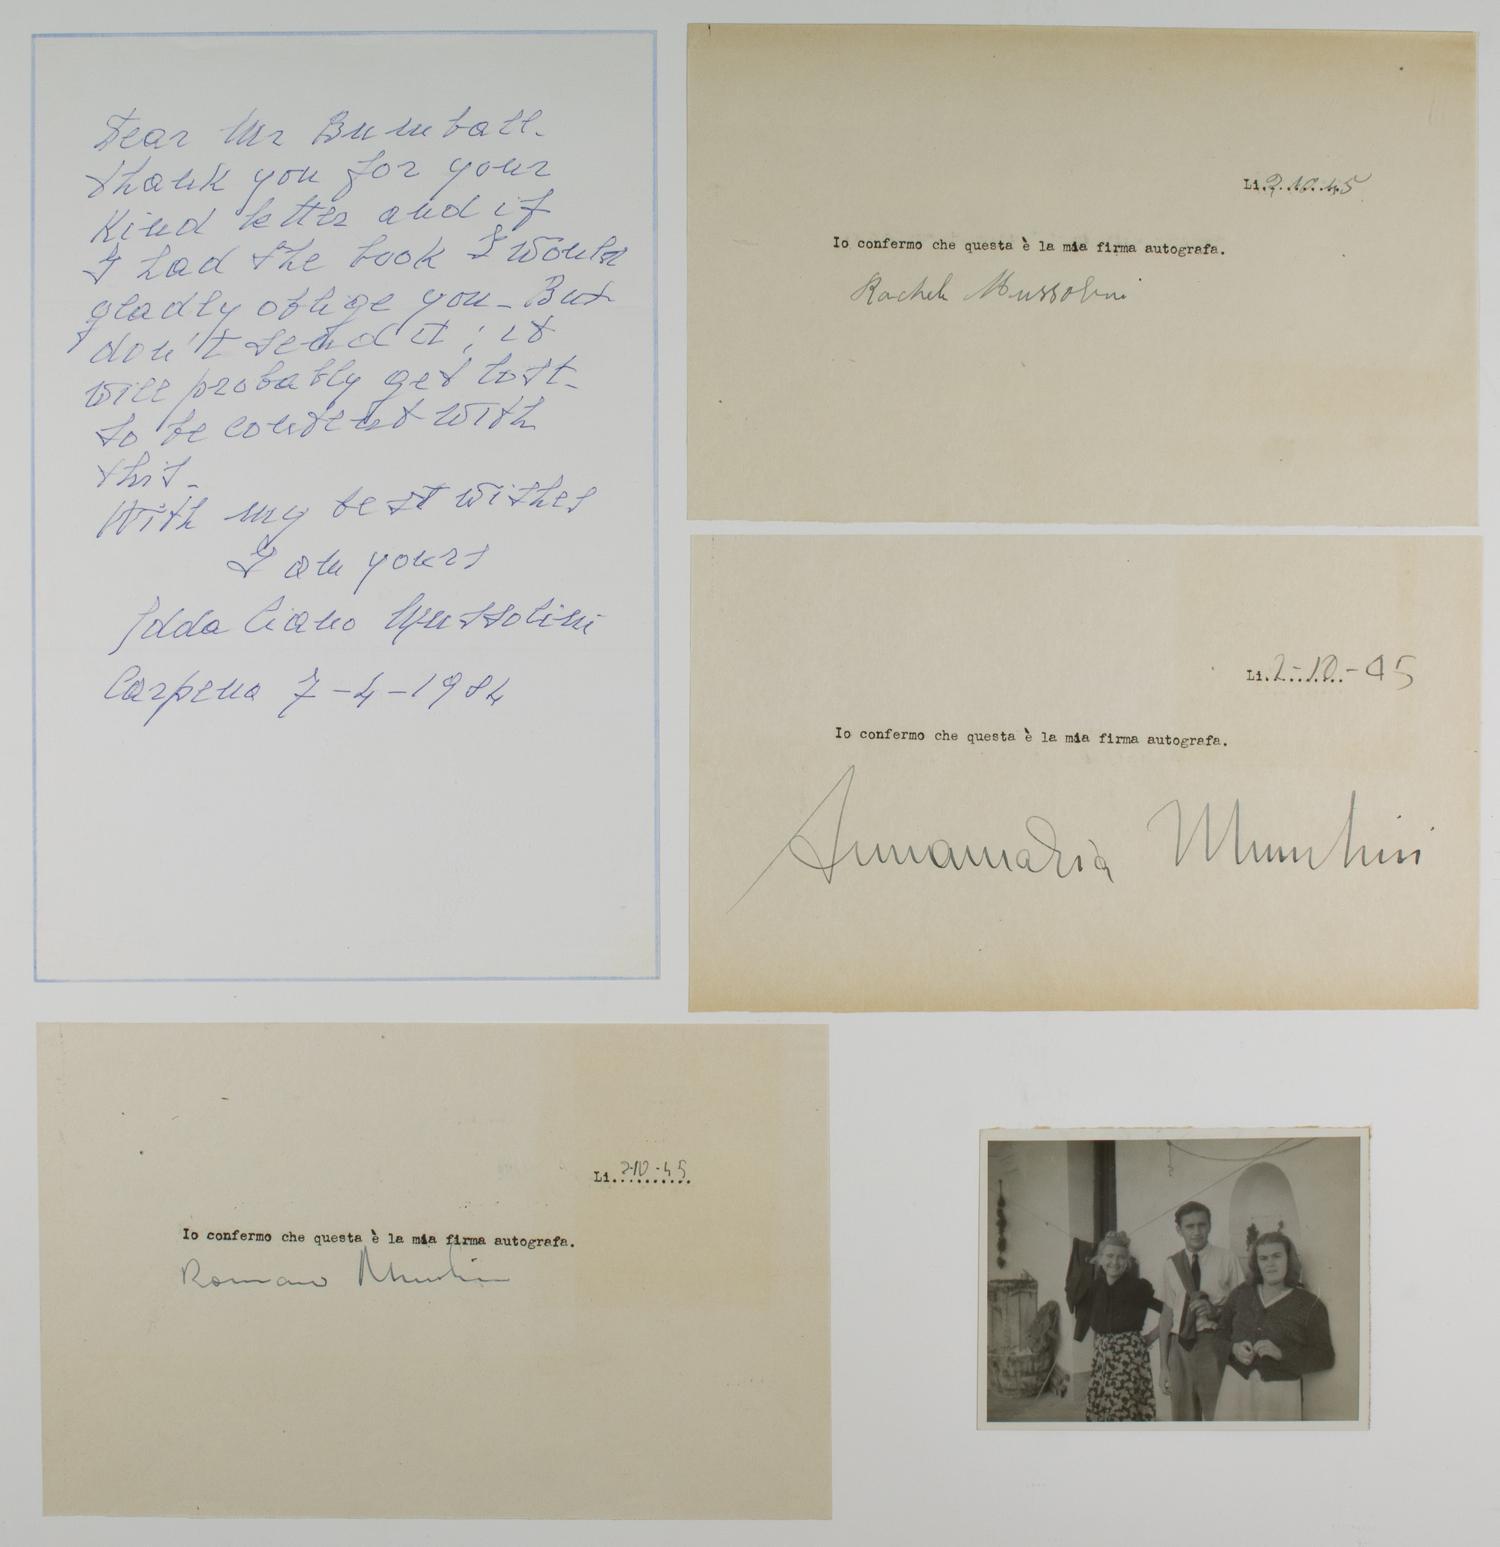 BENITO MUSSOLINI'S FAMILY MEMBERS